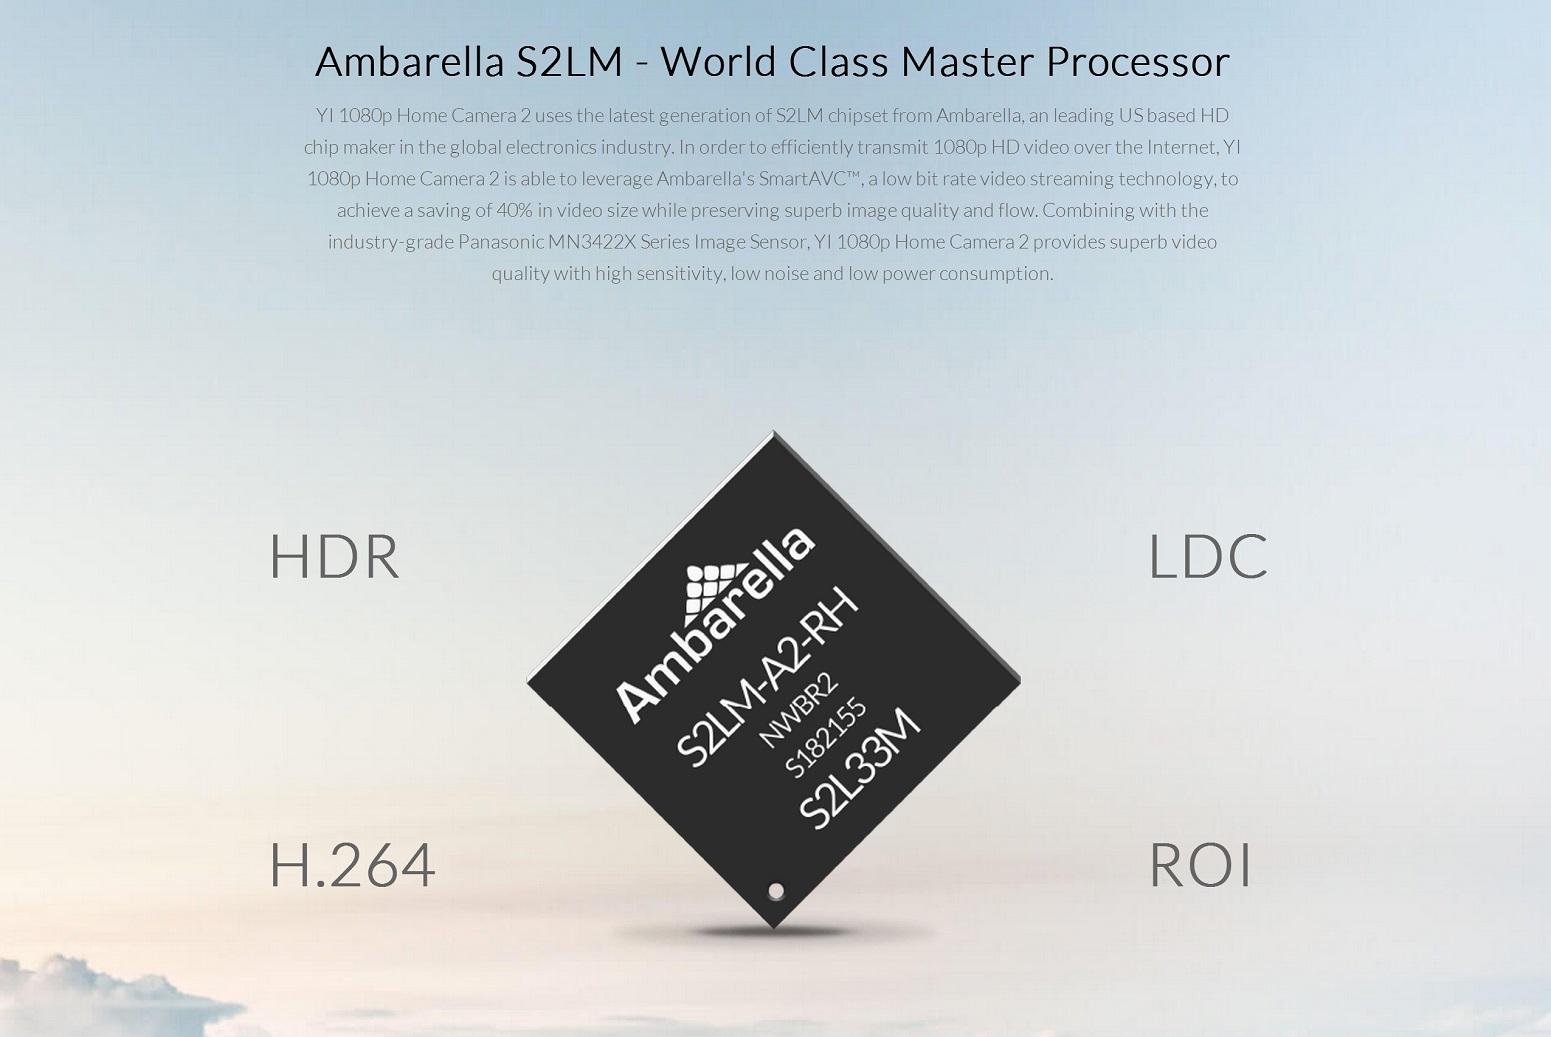 Yi 1080P Home Camera 2